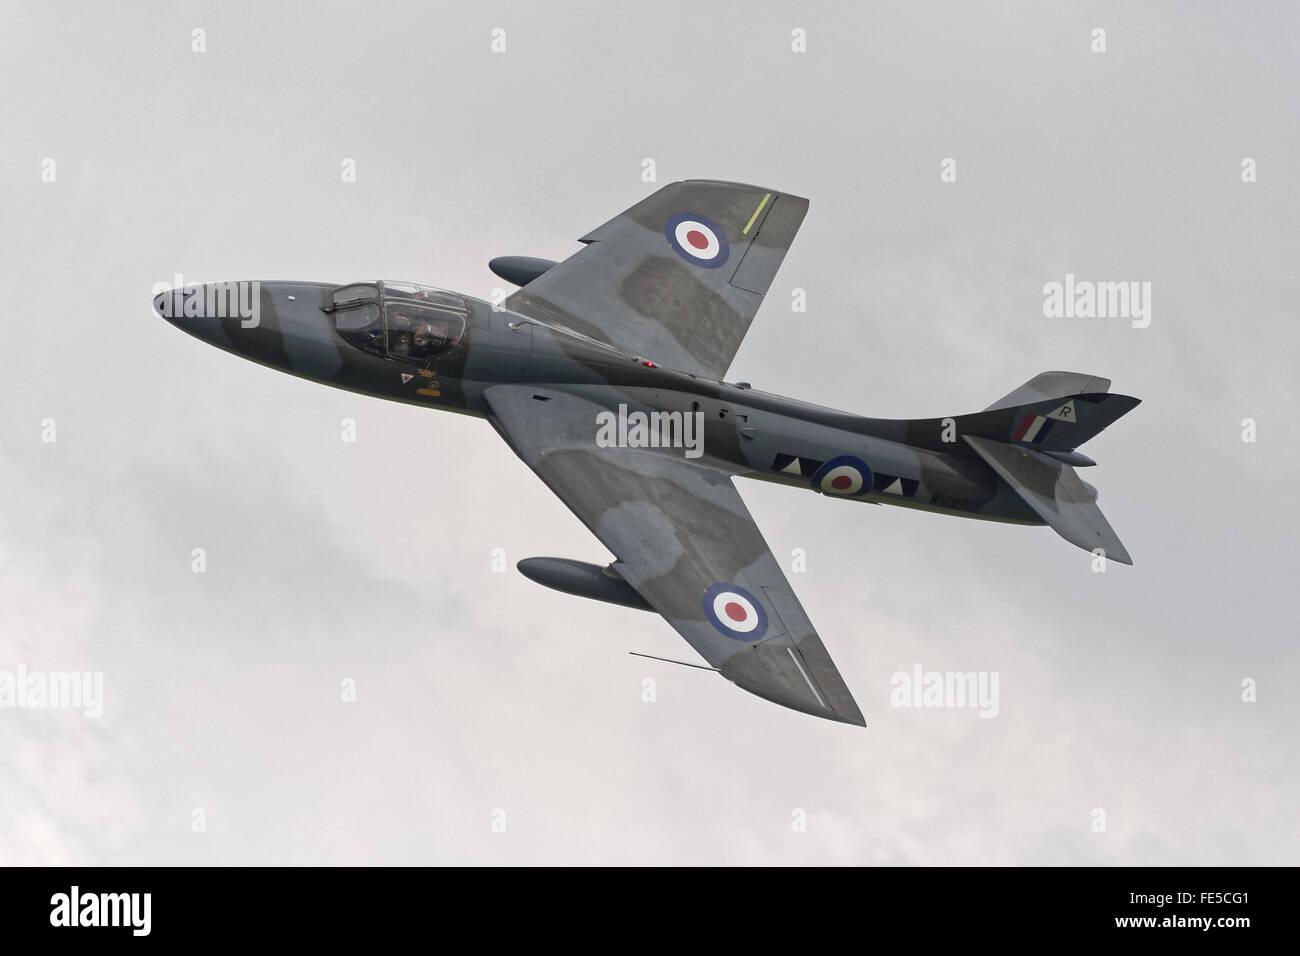 Hawker Hunter T.7 jet aircraft, registration WV372 Stock Photo